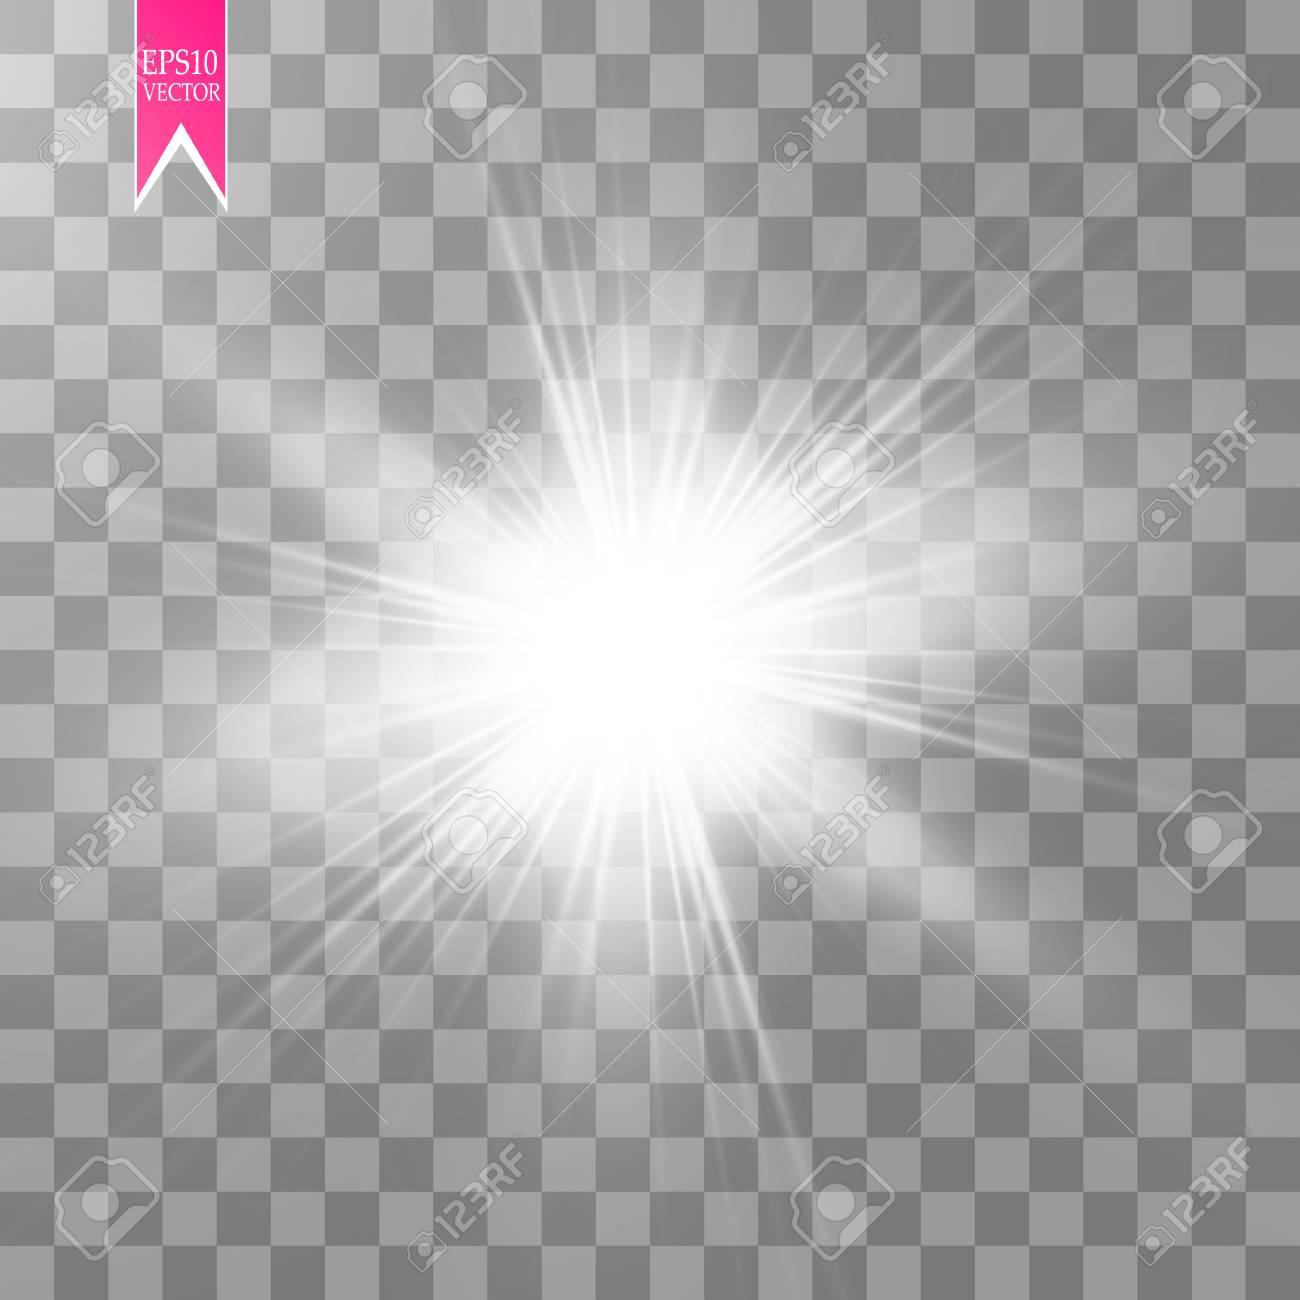 Glow light effect. Starburst with sparkles on transparent background. Vector illustration. - 98178802